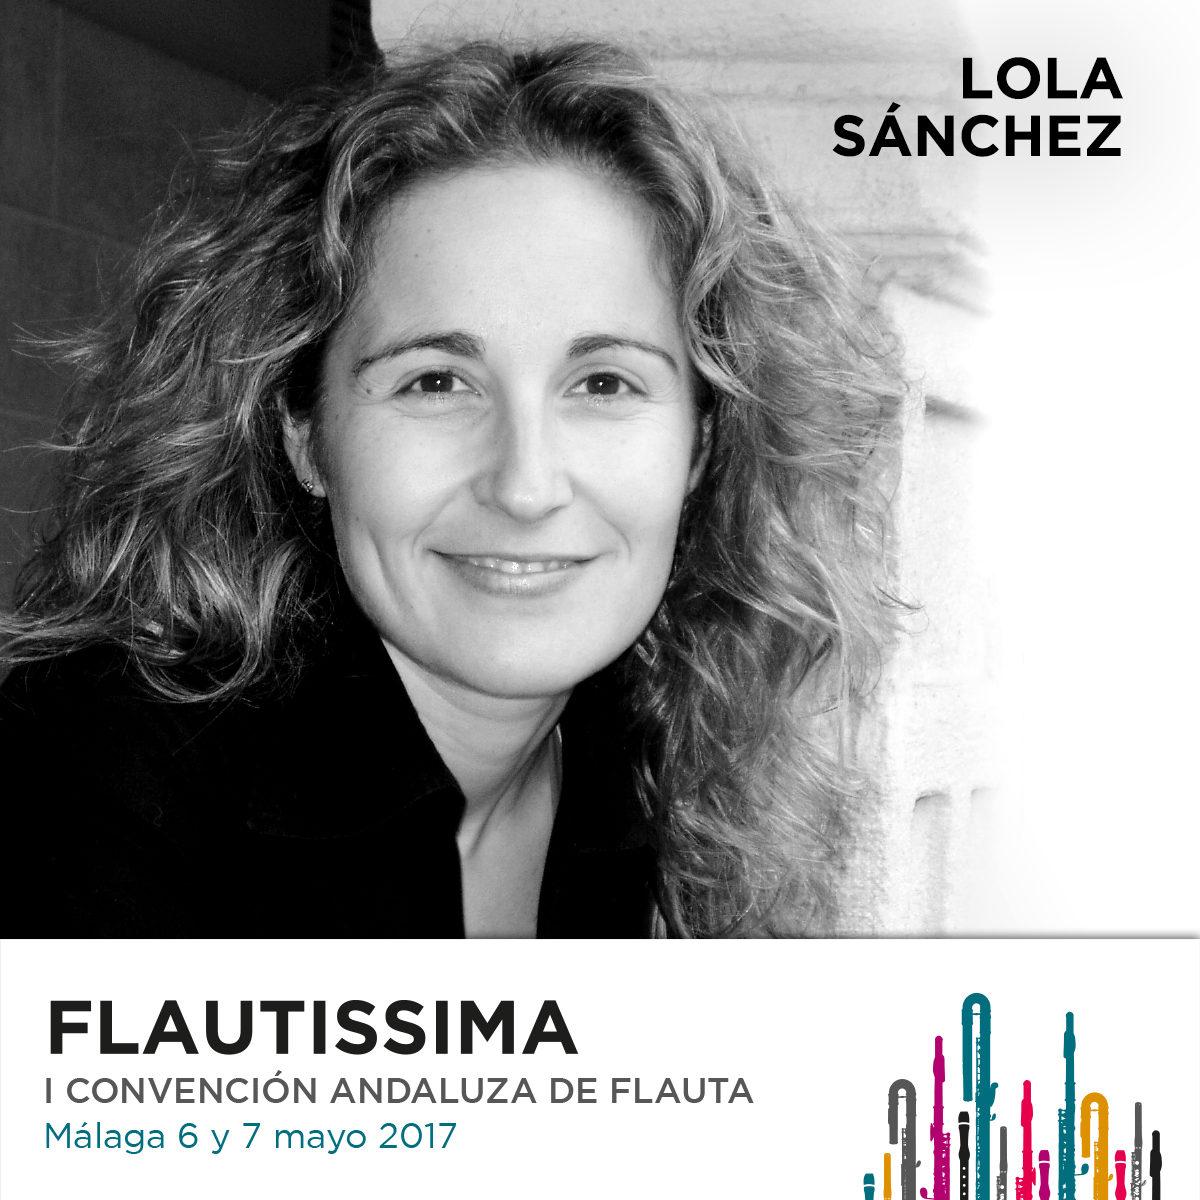 Lola Sánchez Flautissima